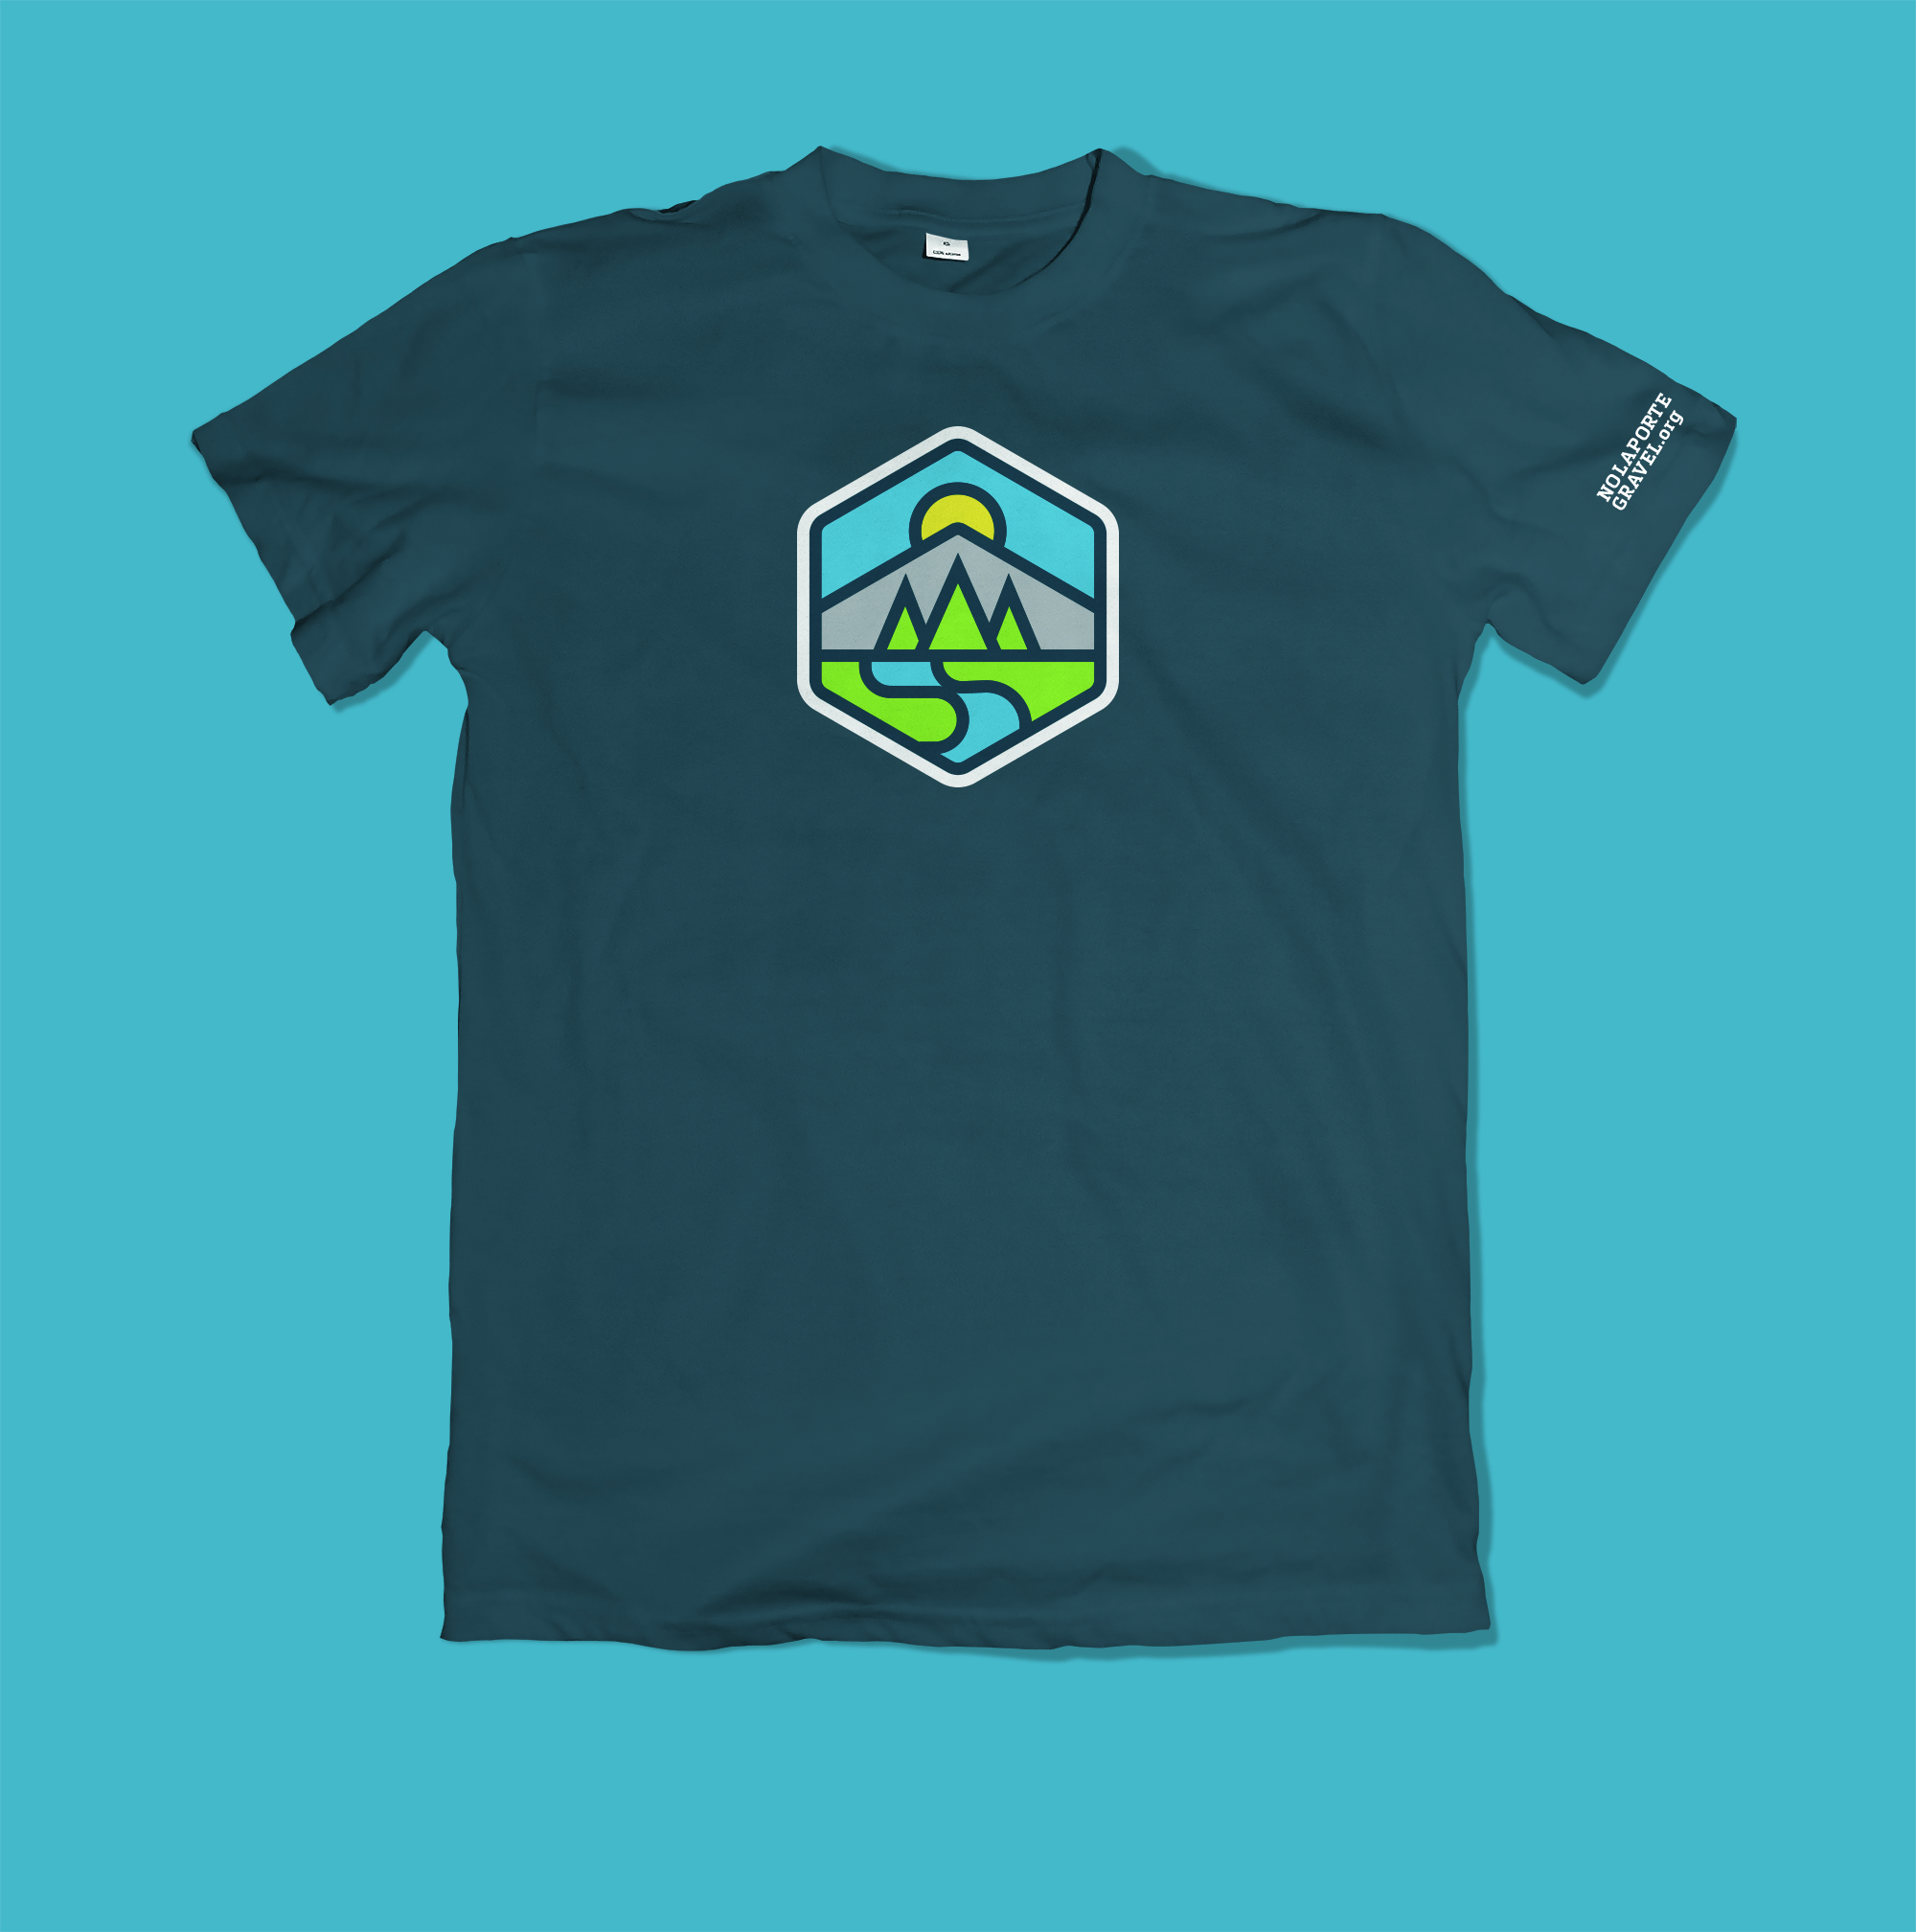 NLG_t-shirt_mockup.jpg